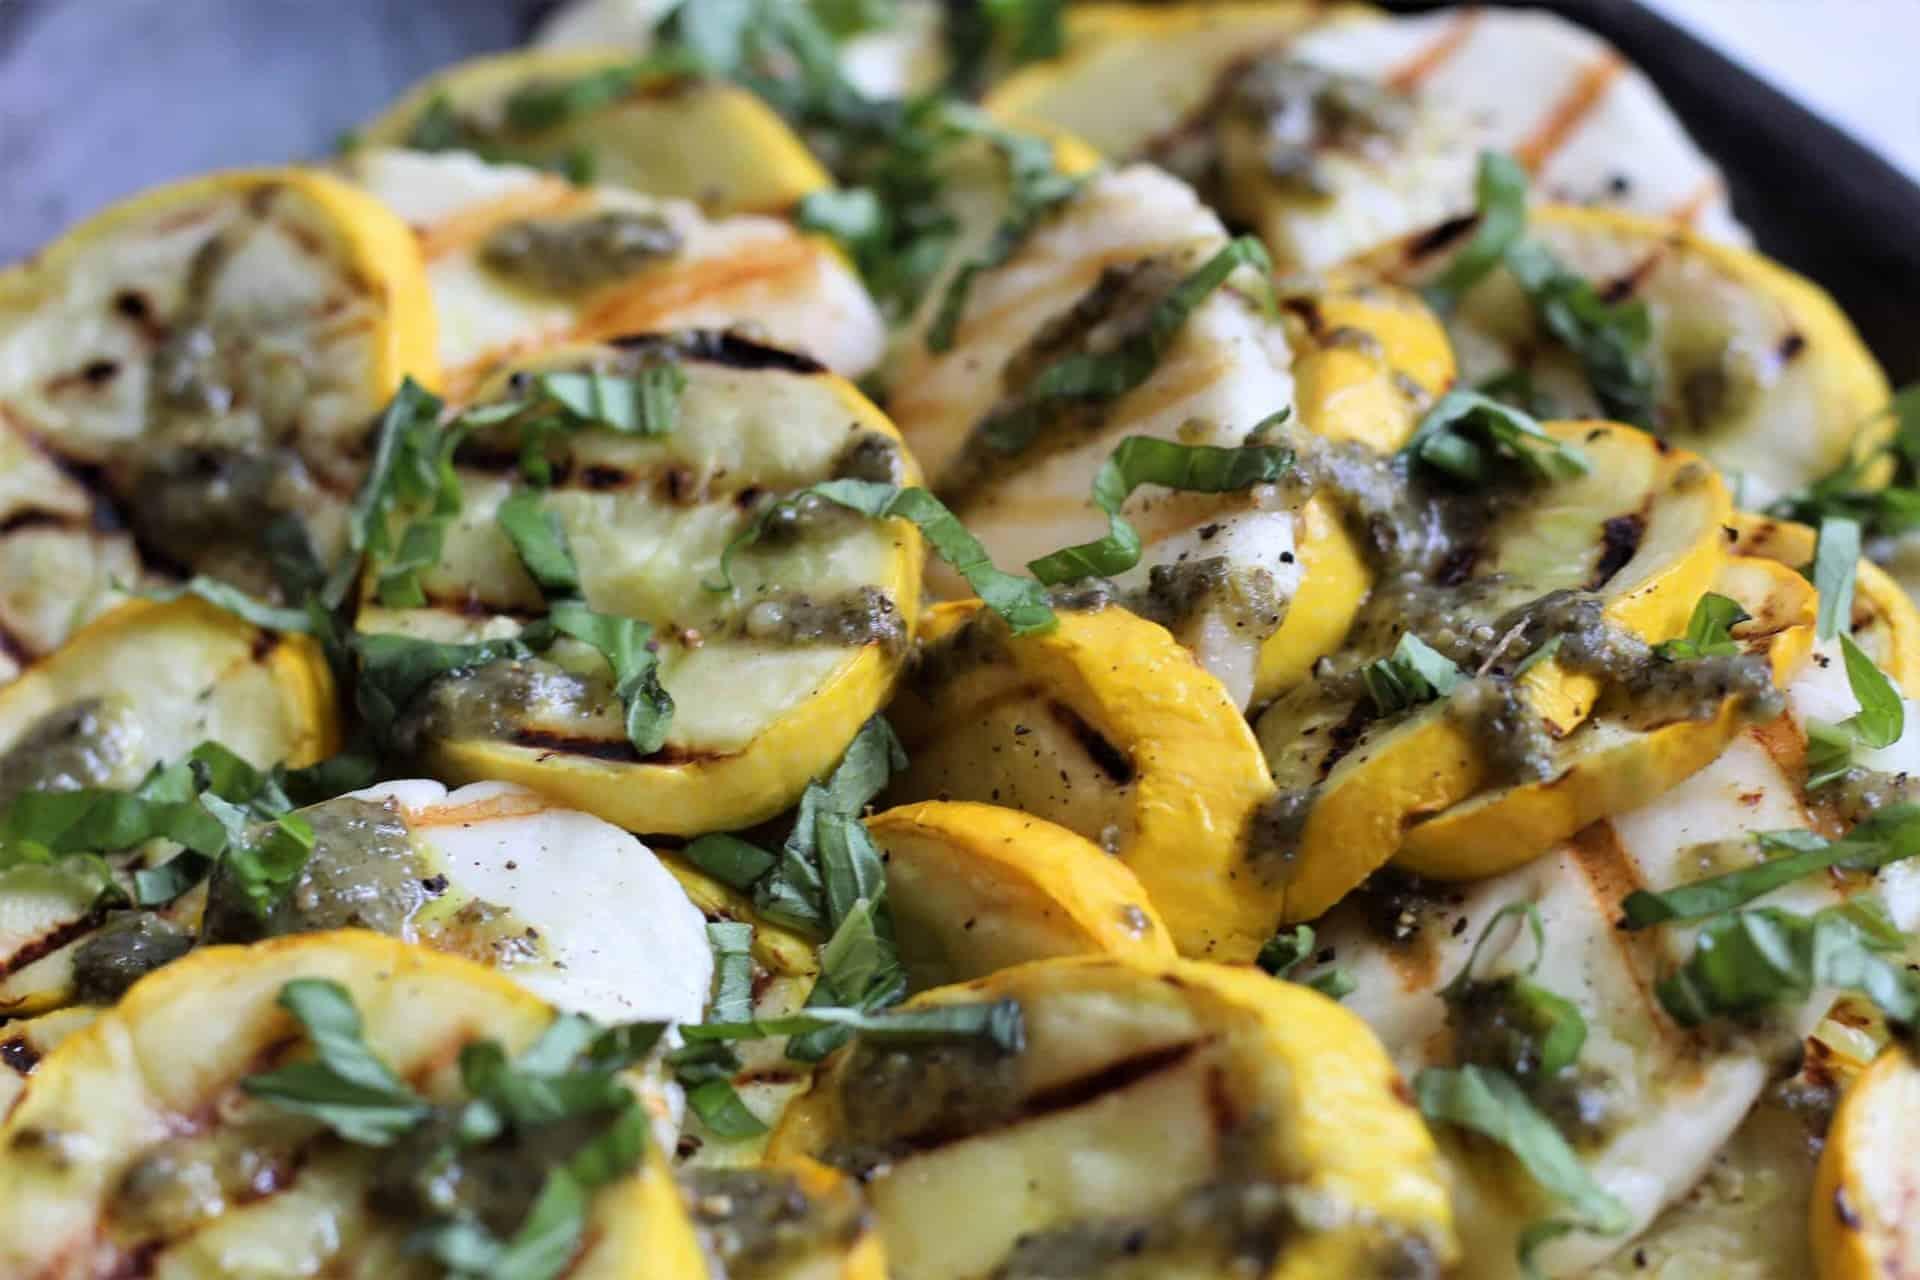 Vegetarian, Gluten-Free, Salad, Summer, Squash, Halloumi, Zucchini, Side